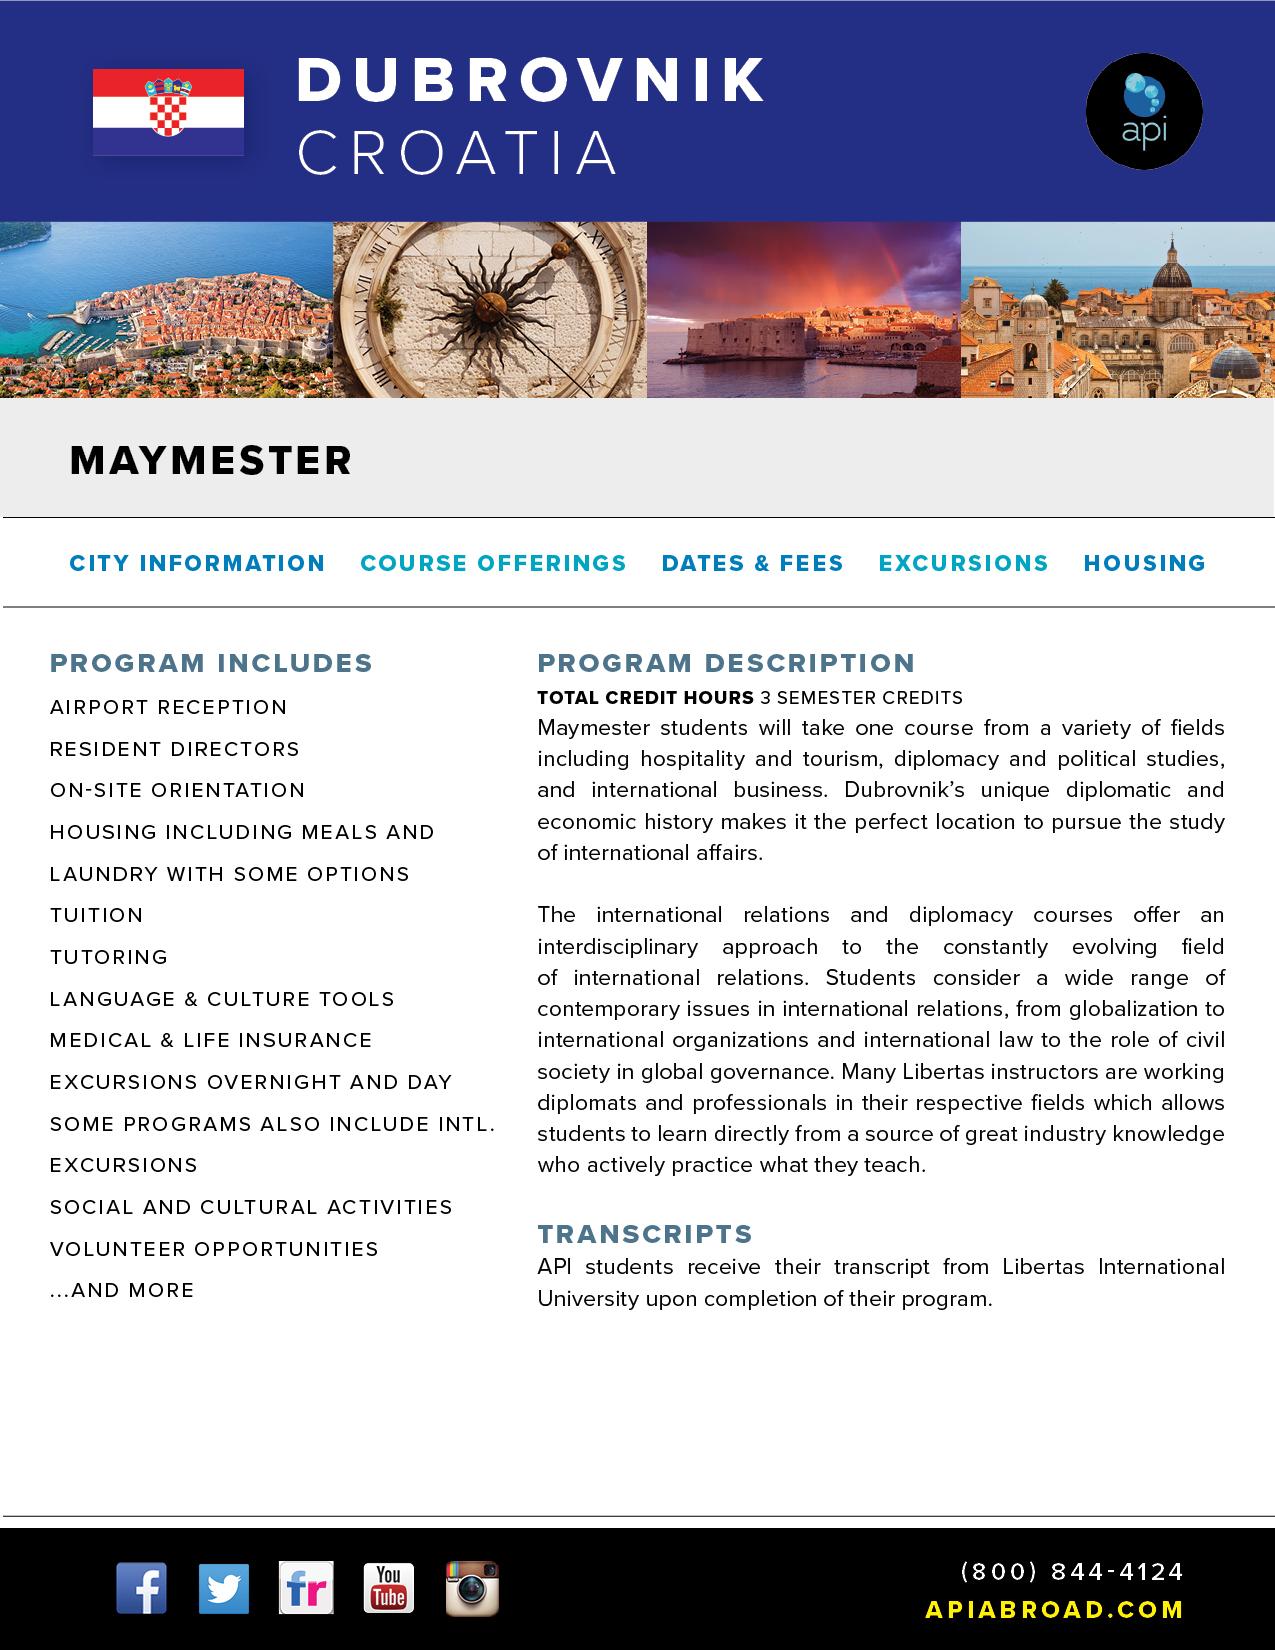 API Study Abroad in Croatia